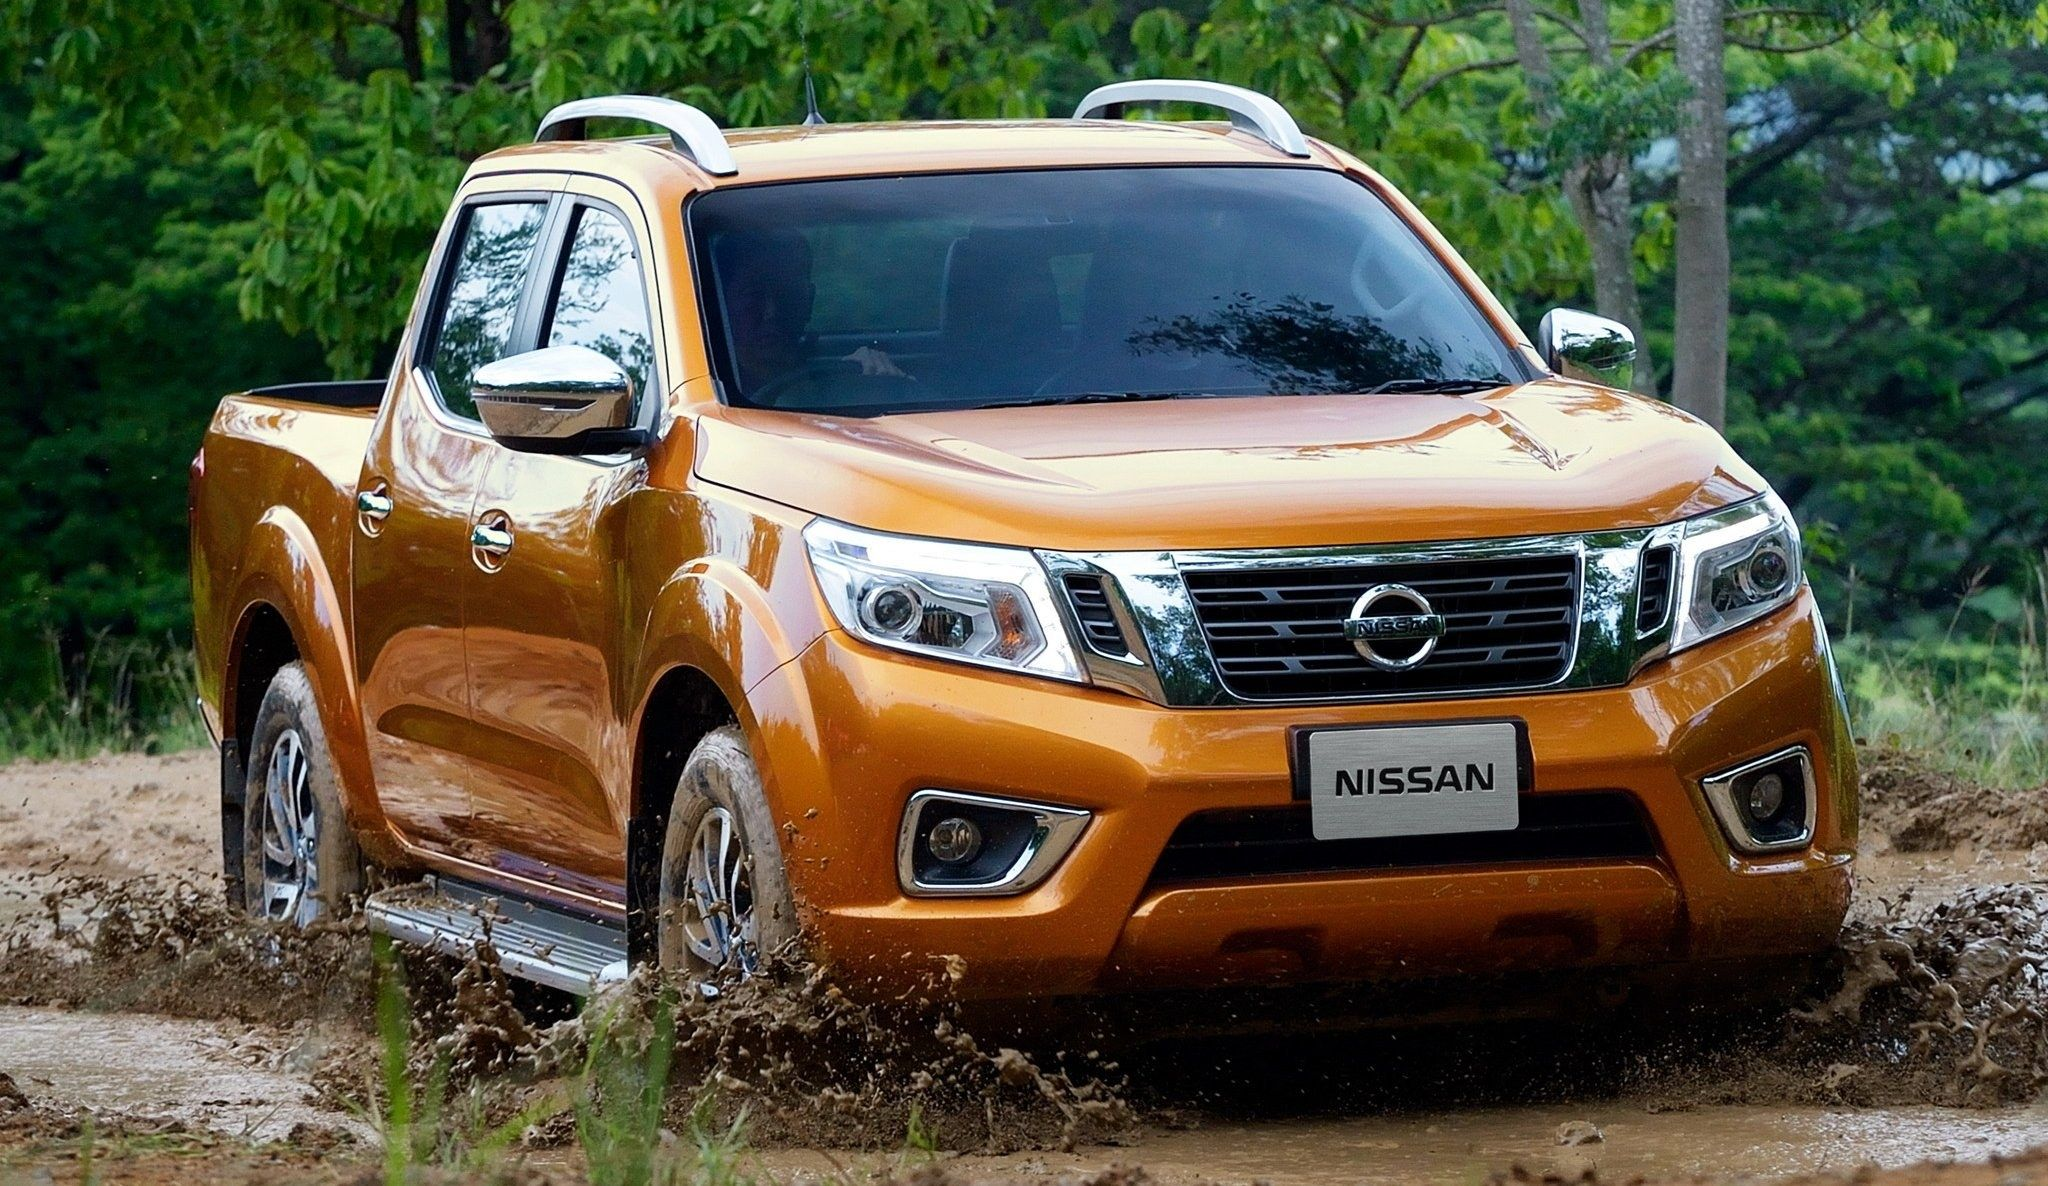 2020 Nissan Navara 2020 Nissan Navara 2020 Nissan Navara Australia 2020 Nissan Navara Release Date All New Nissan Nava Nissan Navara Nissan Nissan Terrano